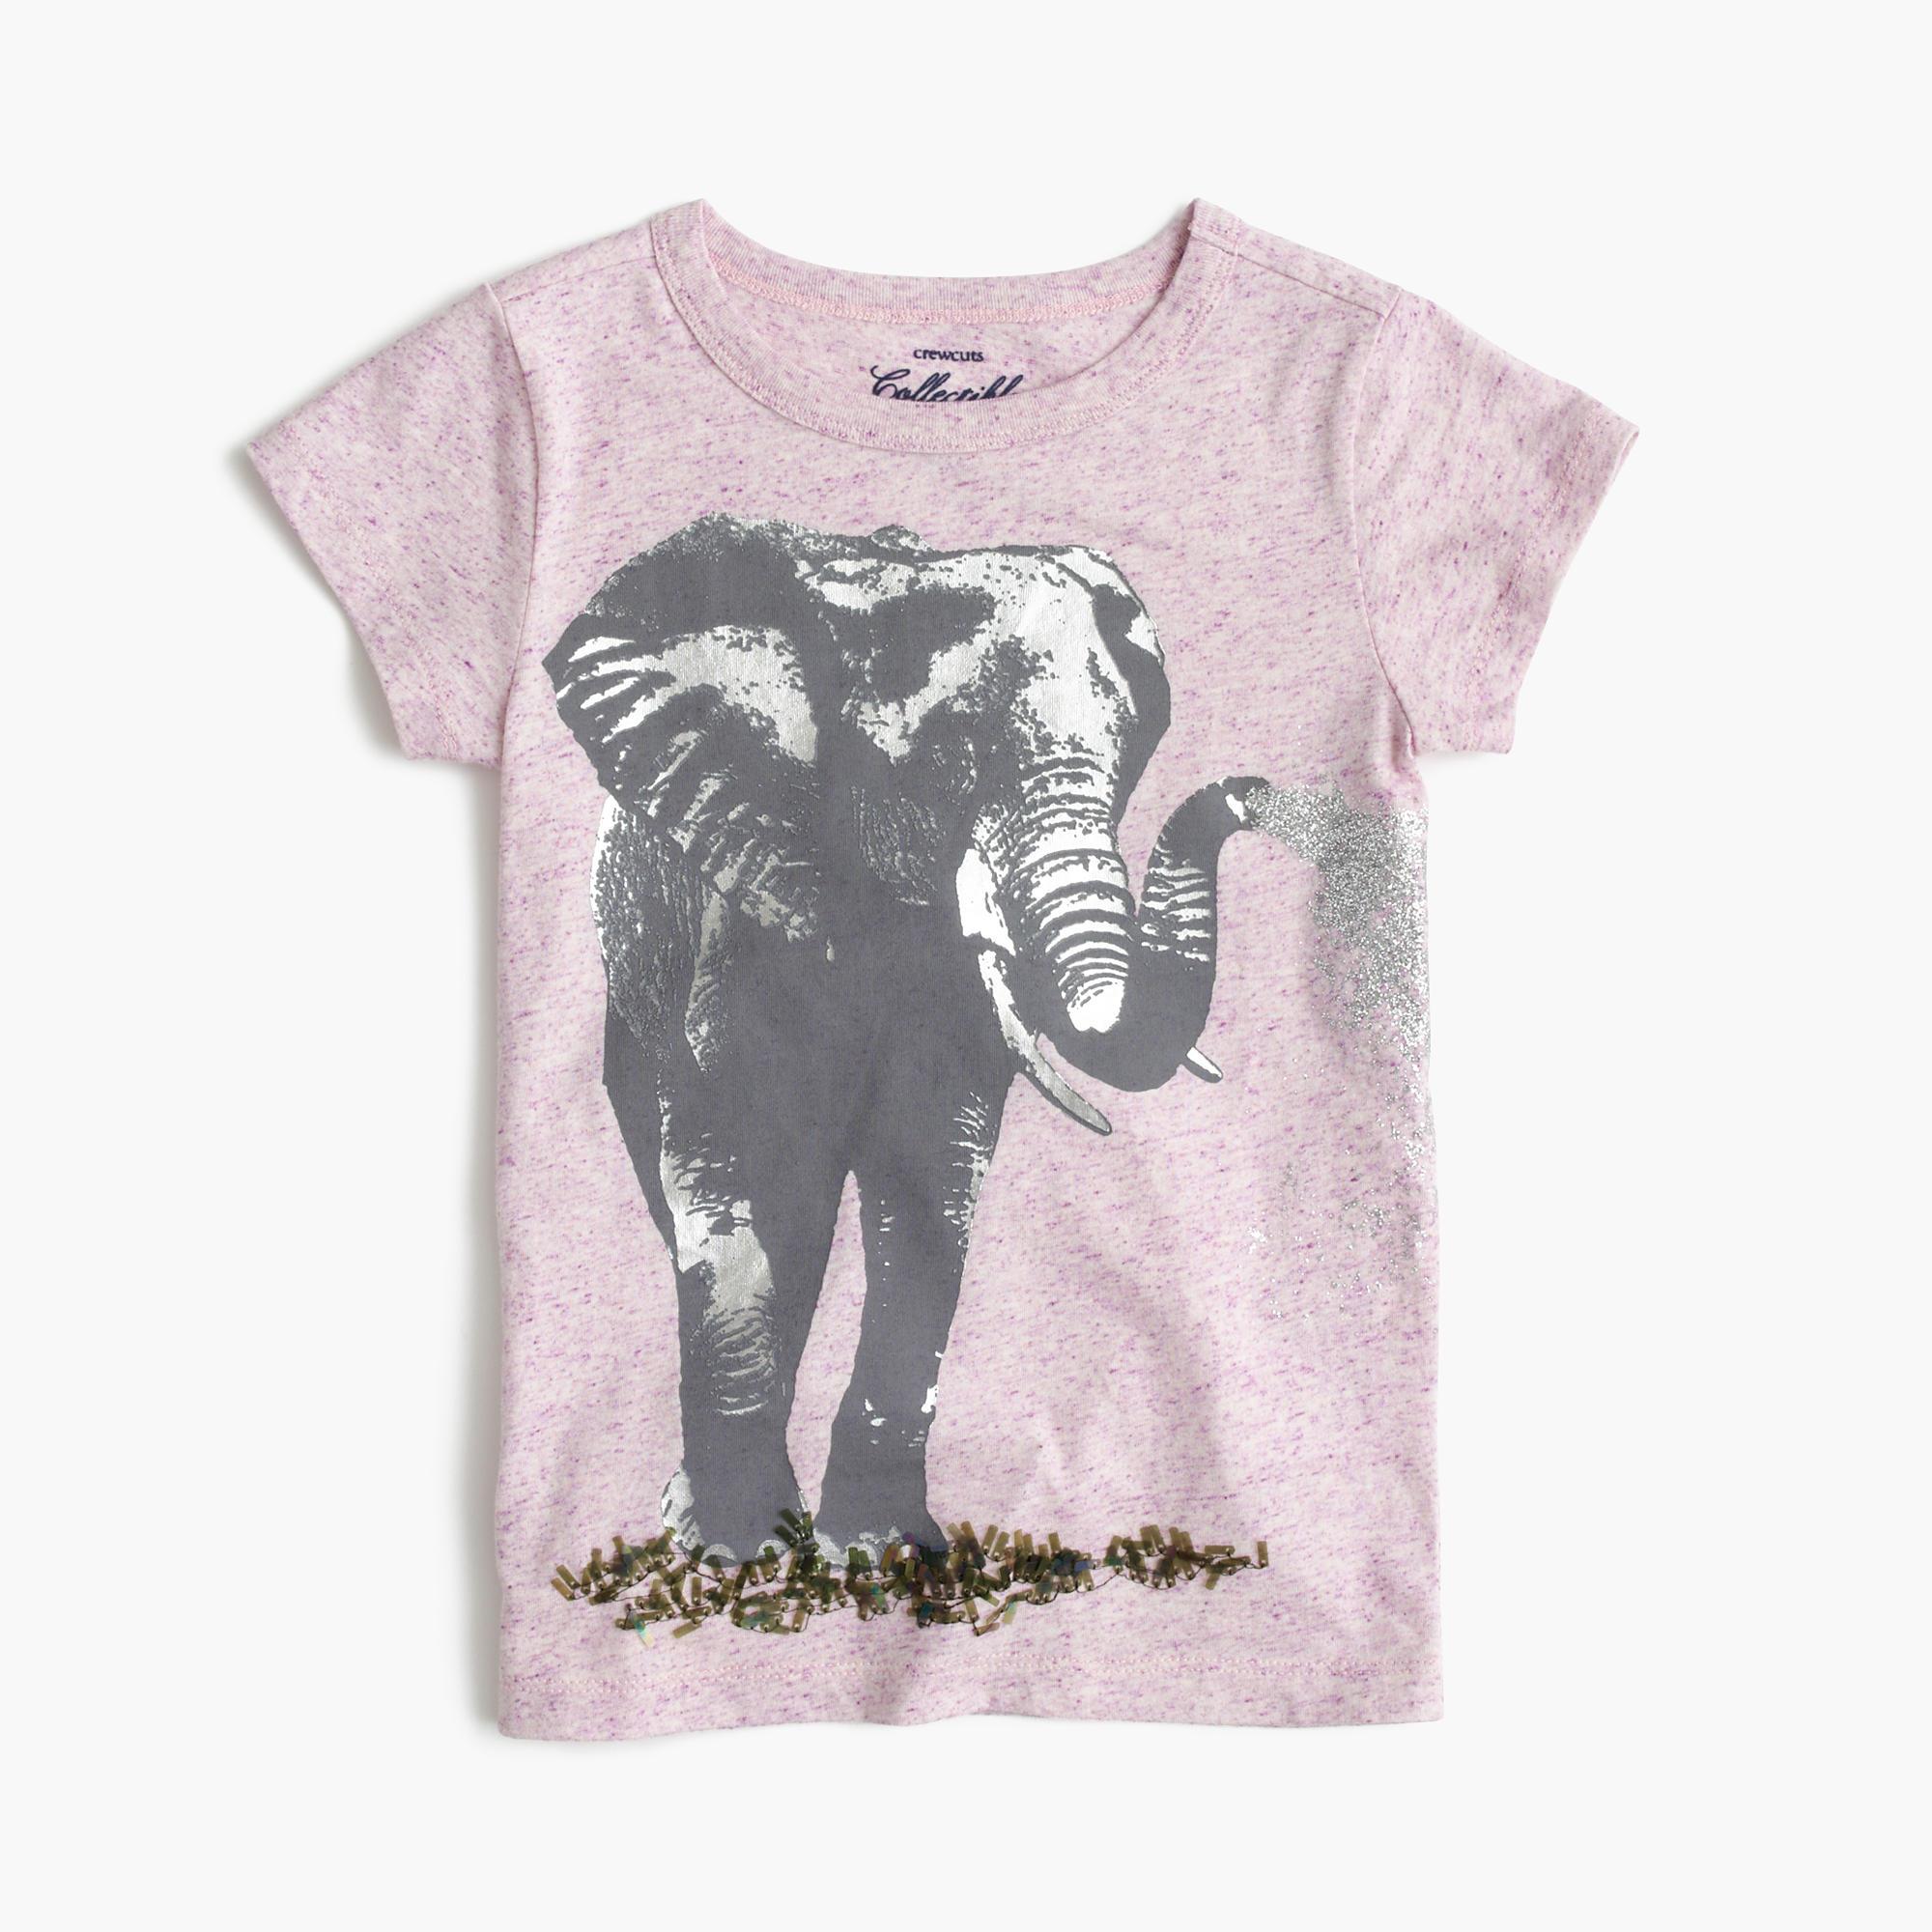 Girls 39 elephant t shirt j crew for Elephant t shirt women s